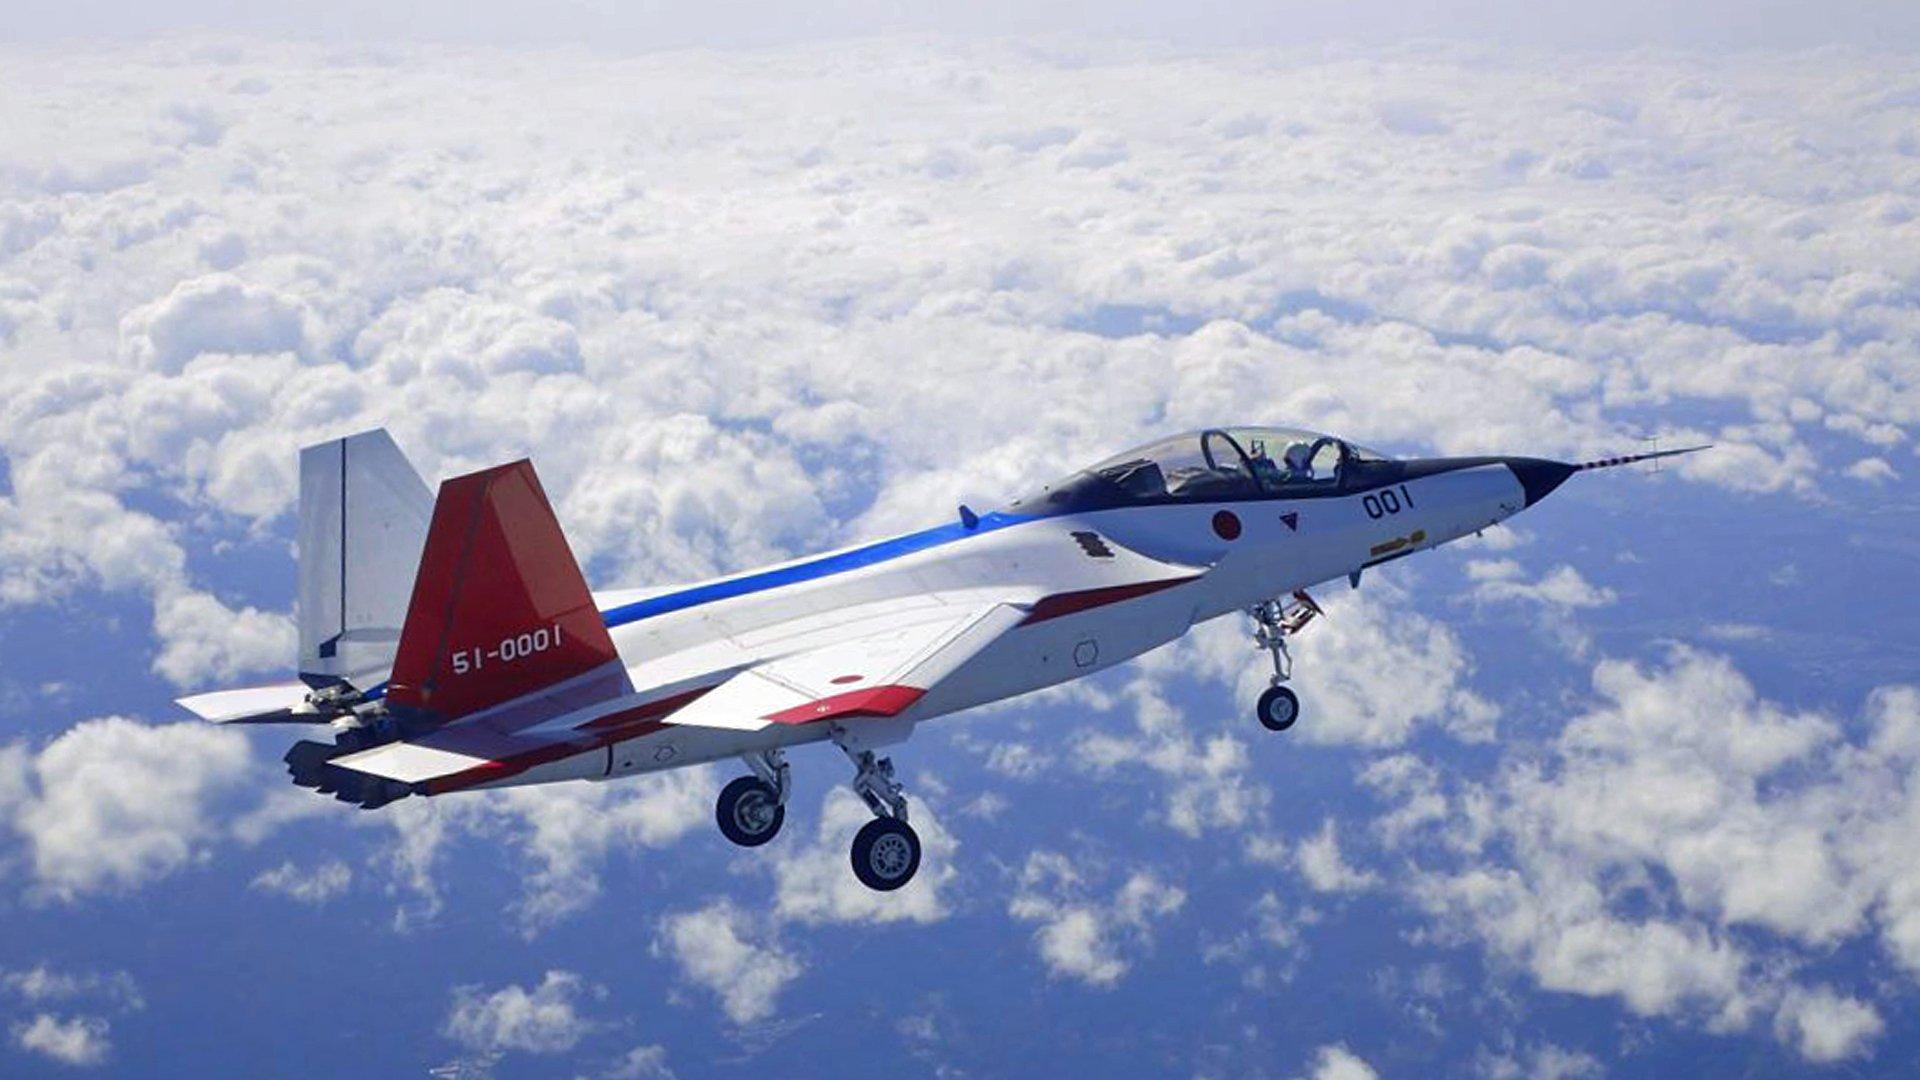 x 2 - 開発中止せよとの声も多い?新型ステルス戦闘機『心神』の開発状況